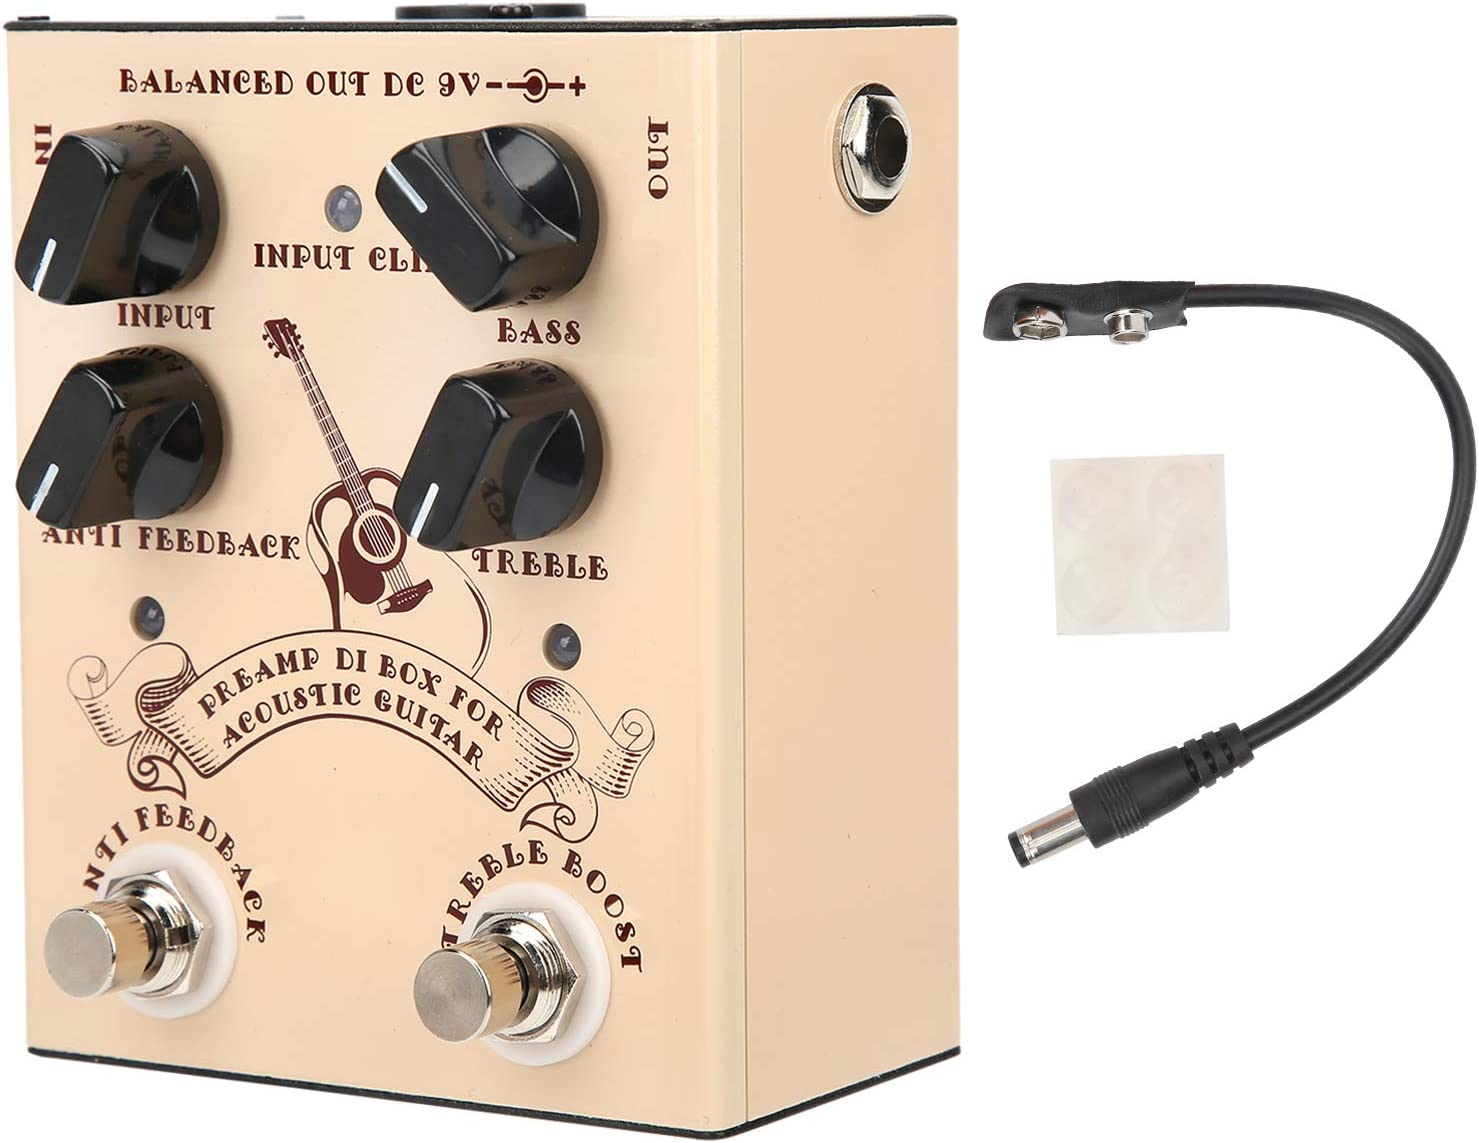 Pedal de efecto de guitarra acústica, caja DI de guitarra para usar este D.I. Marquesina para guitarra y bajo para todos los instrumentos